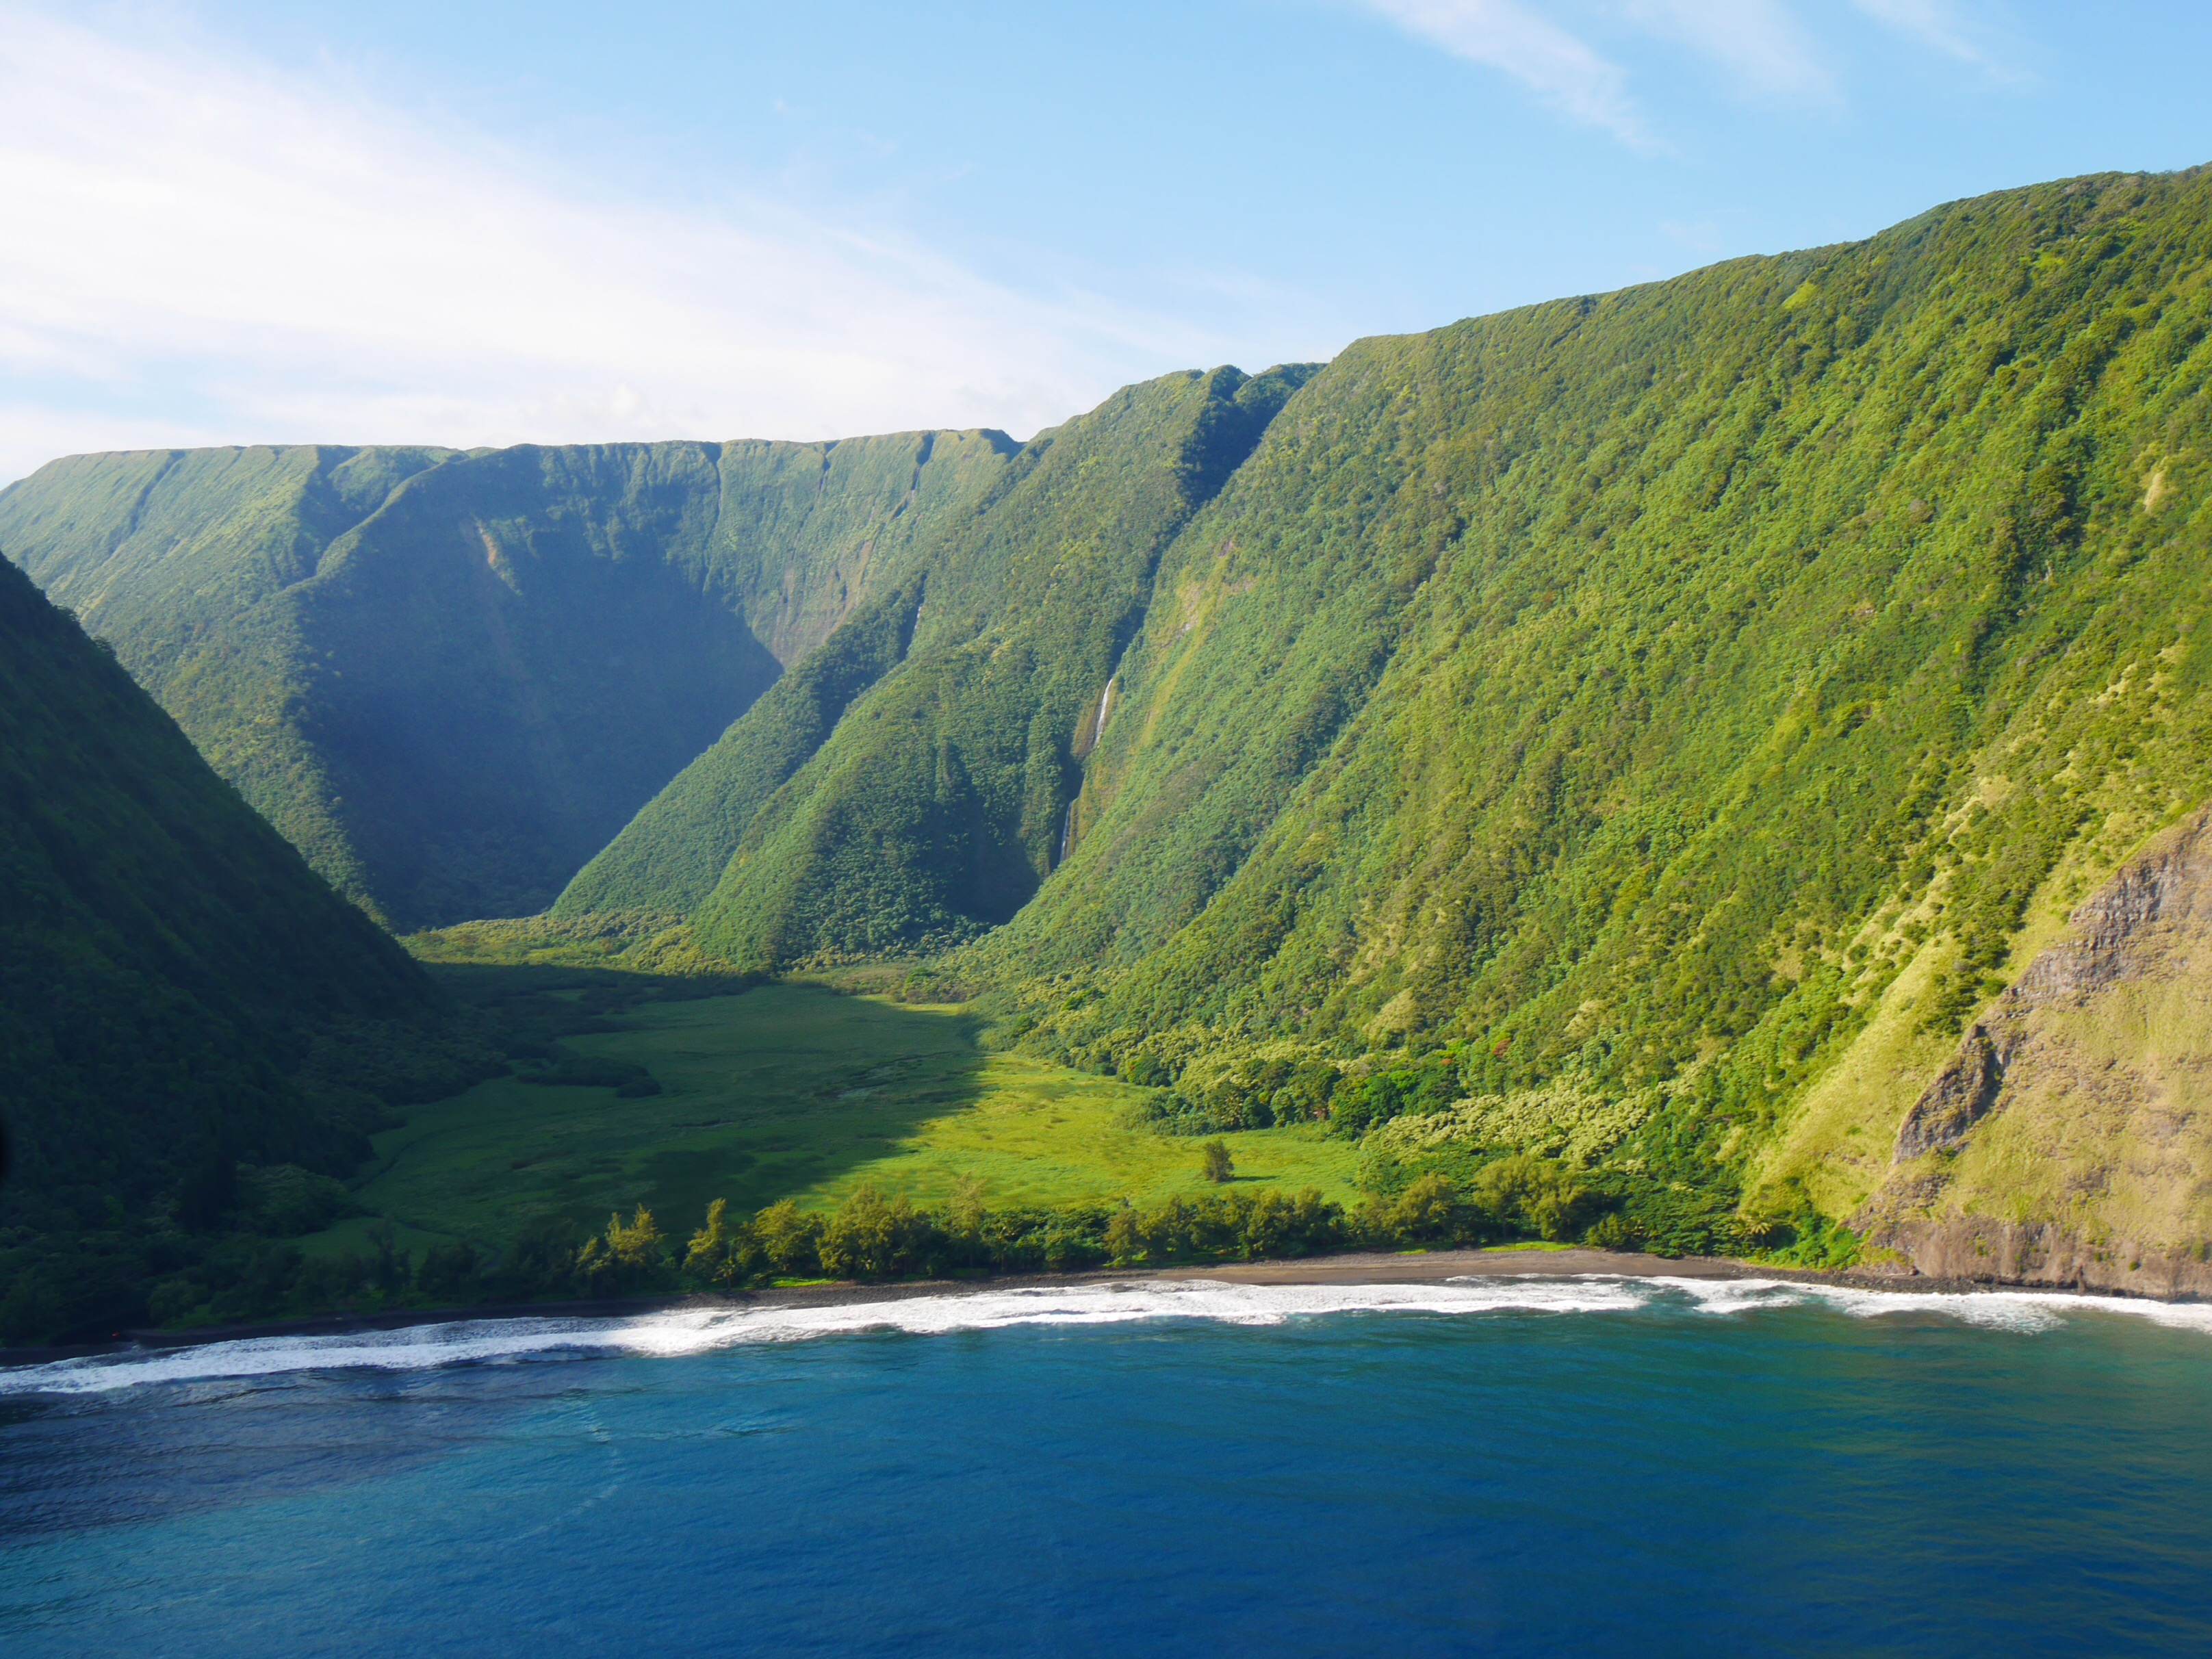 Rainforests and rugged coastline of the Big Island